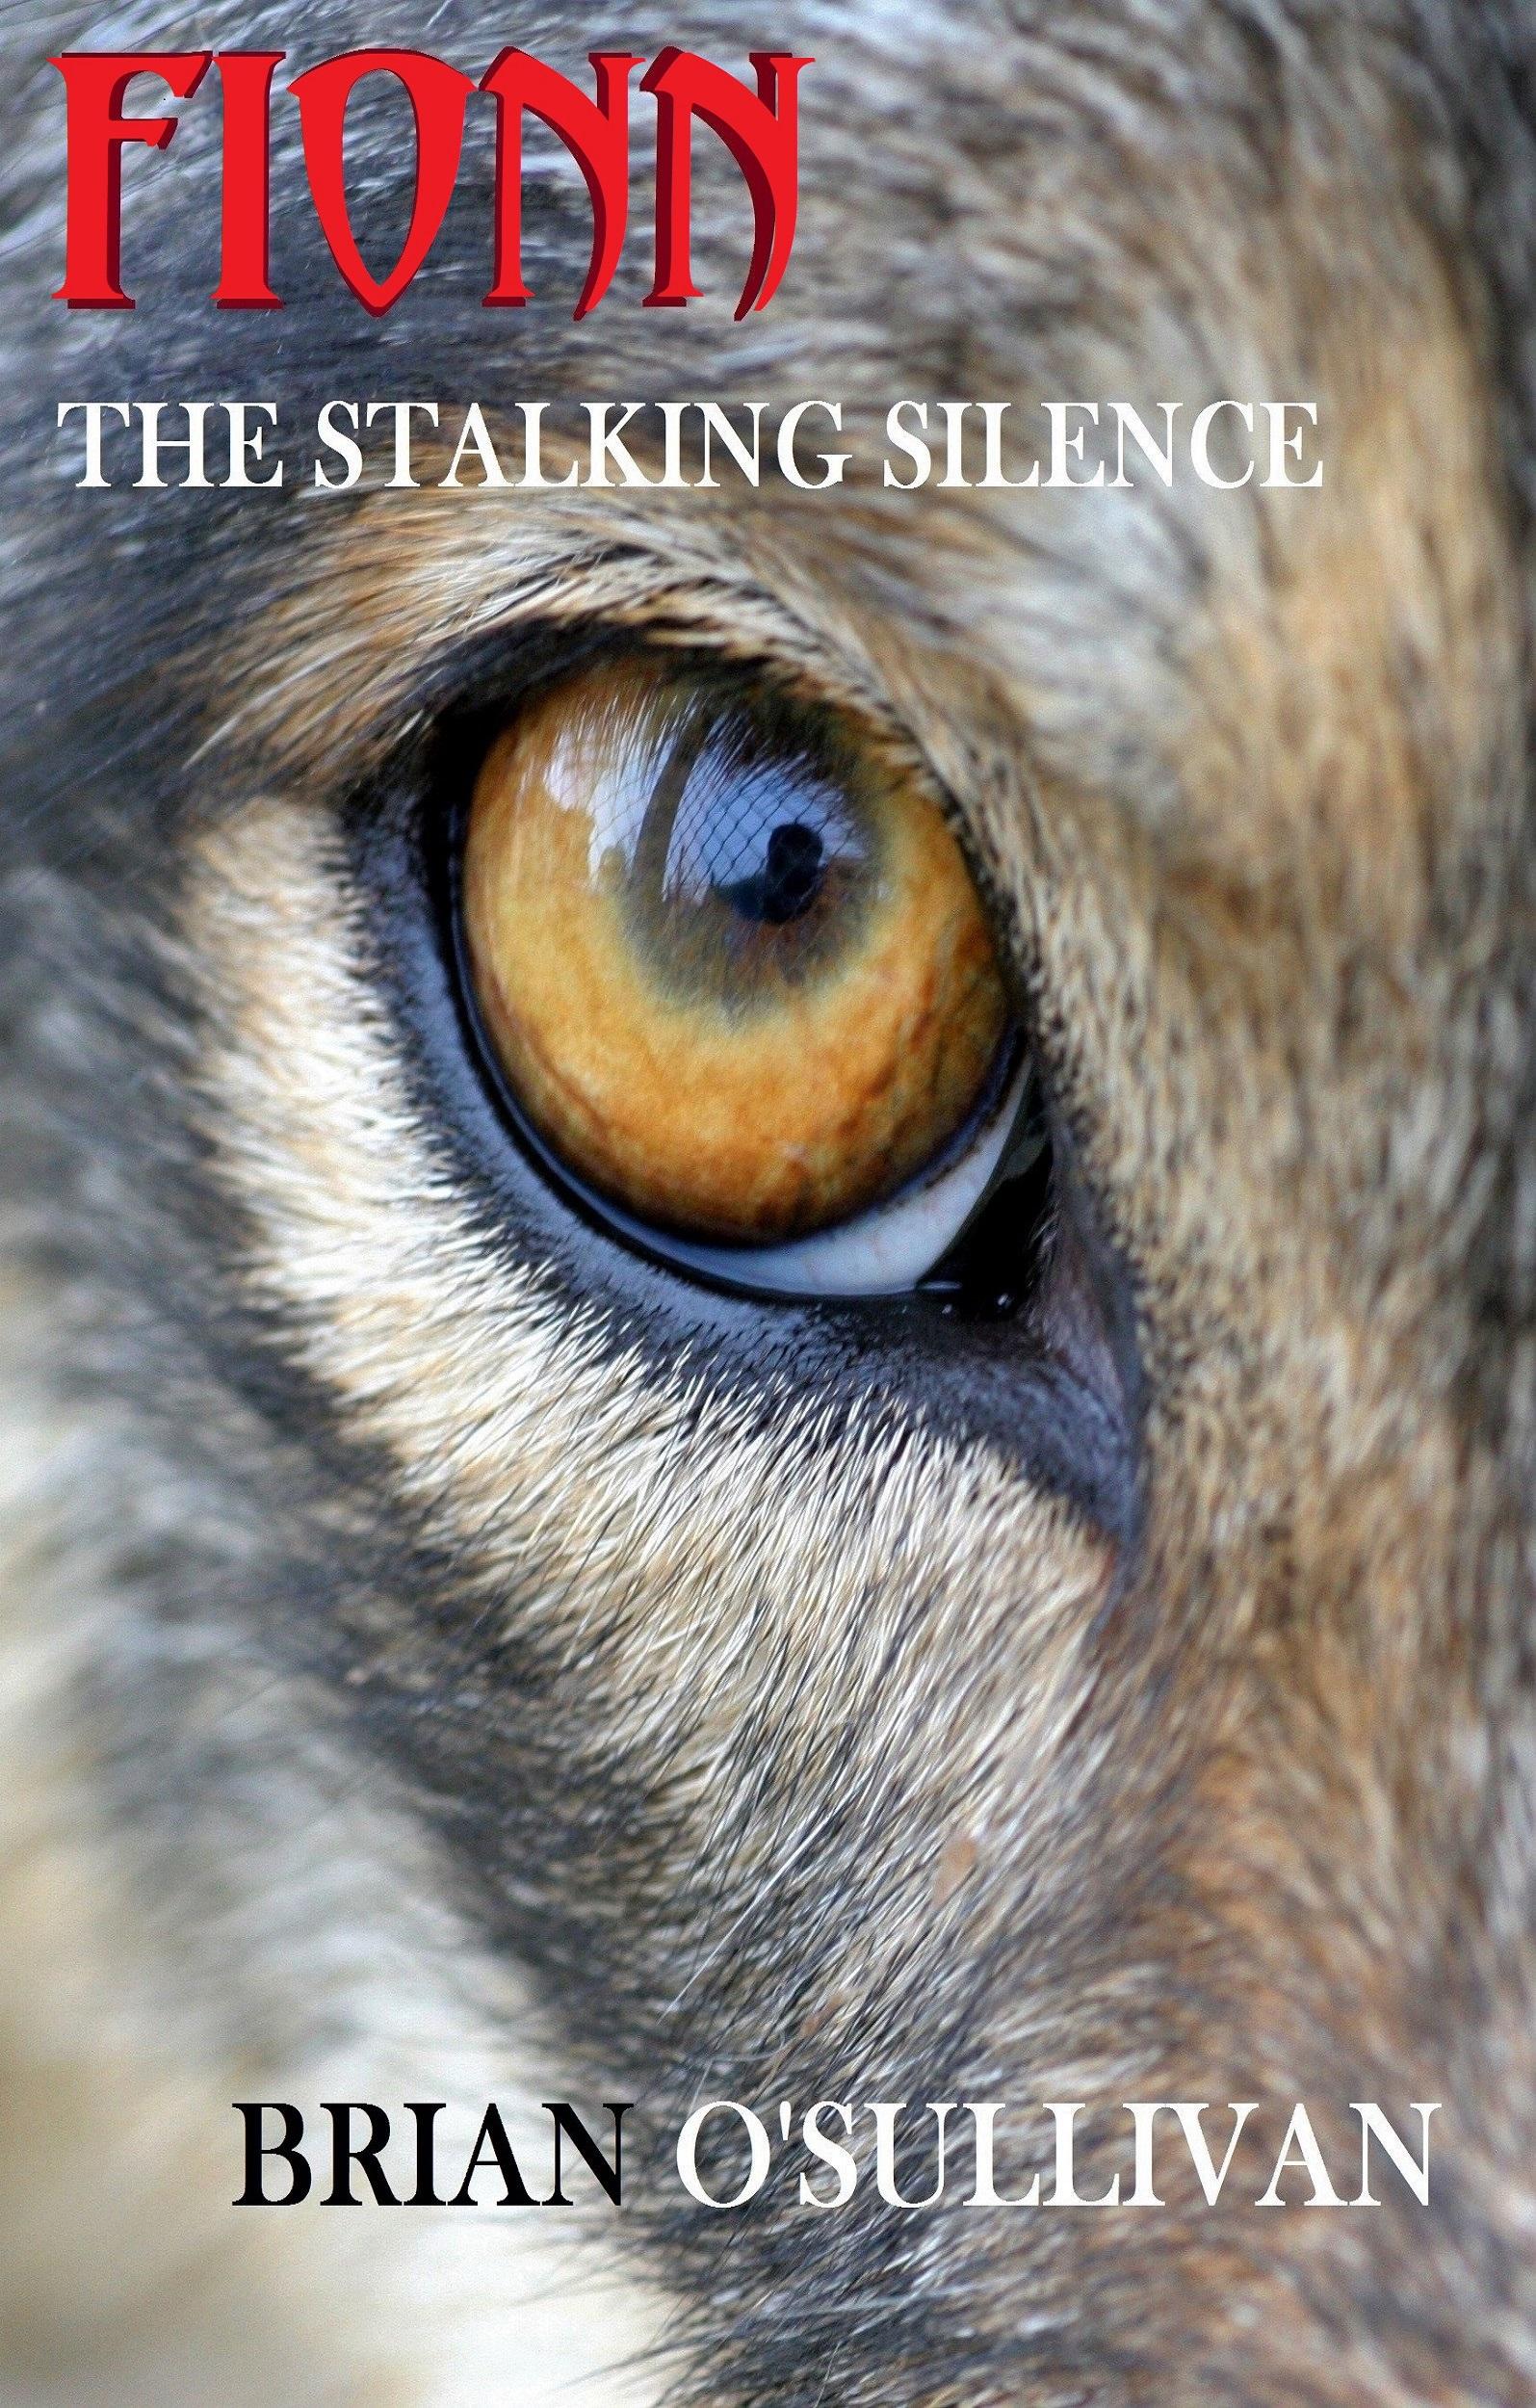 FIONN: The Stalking Silence (AUDIO)